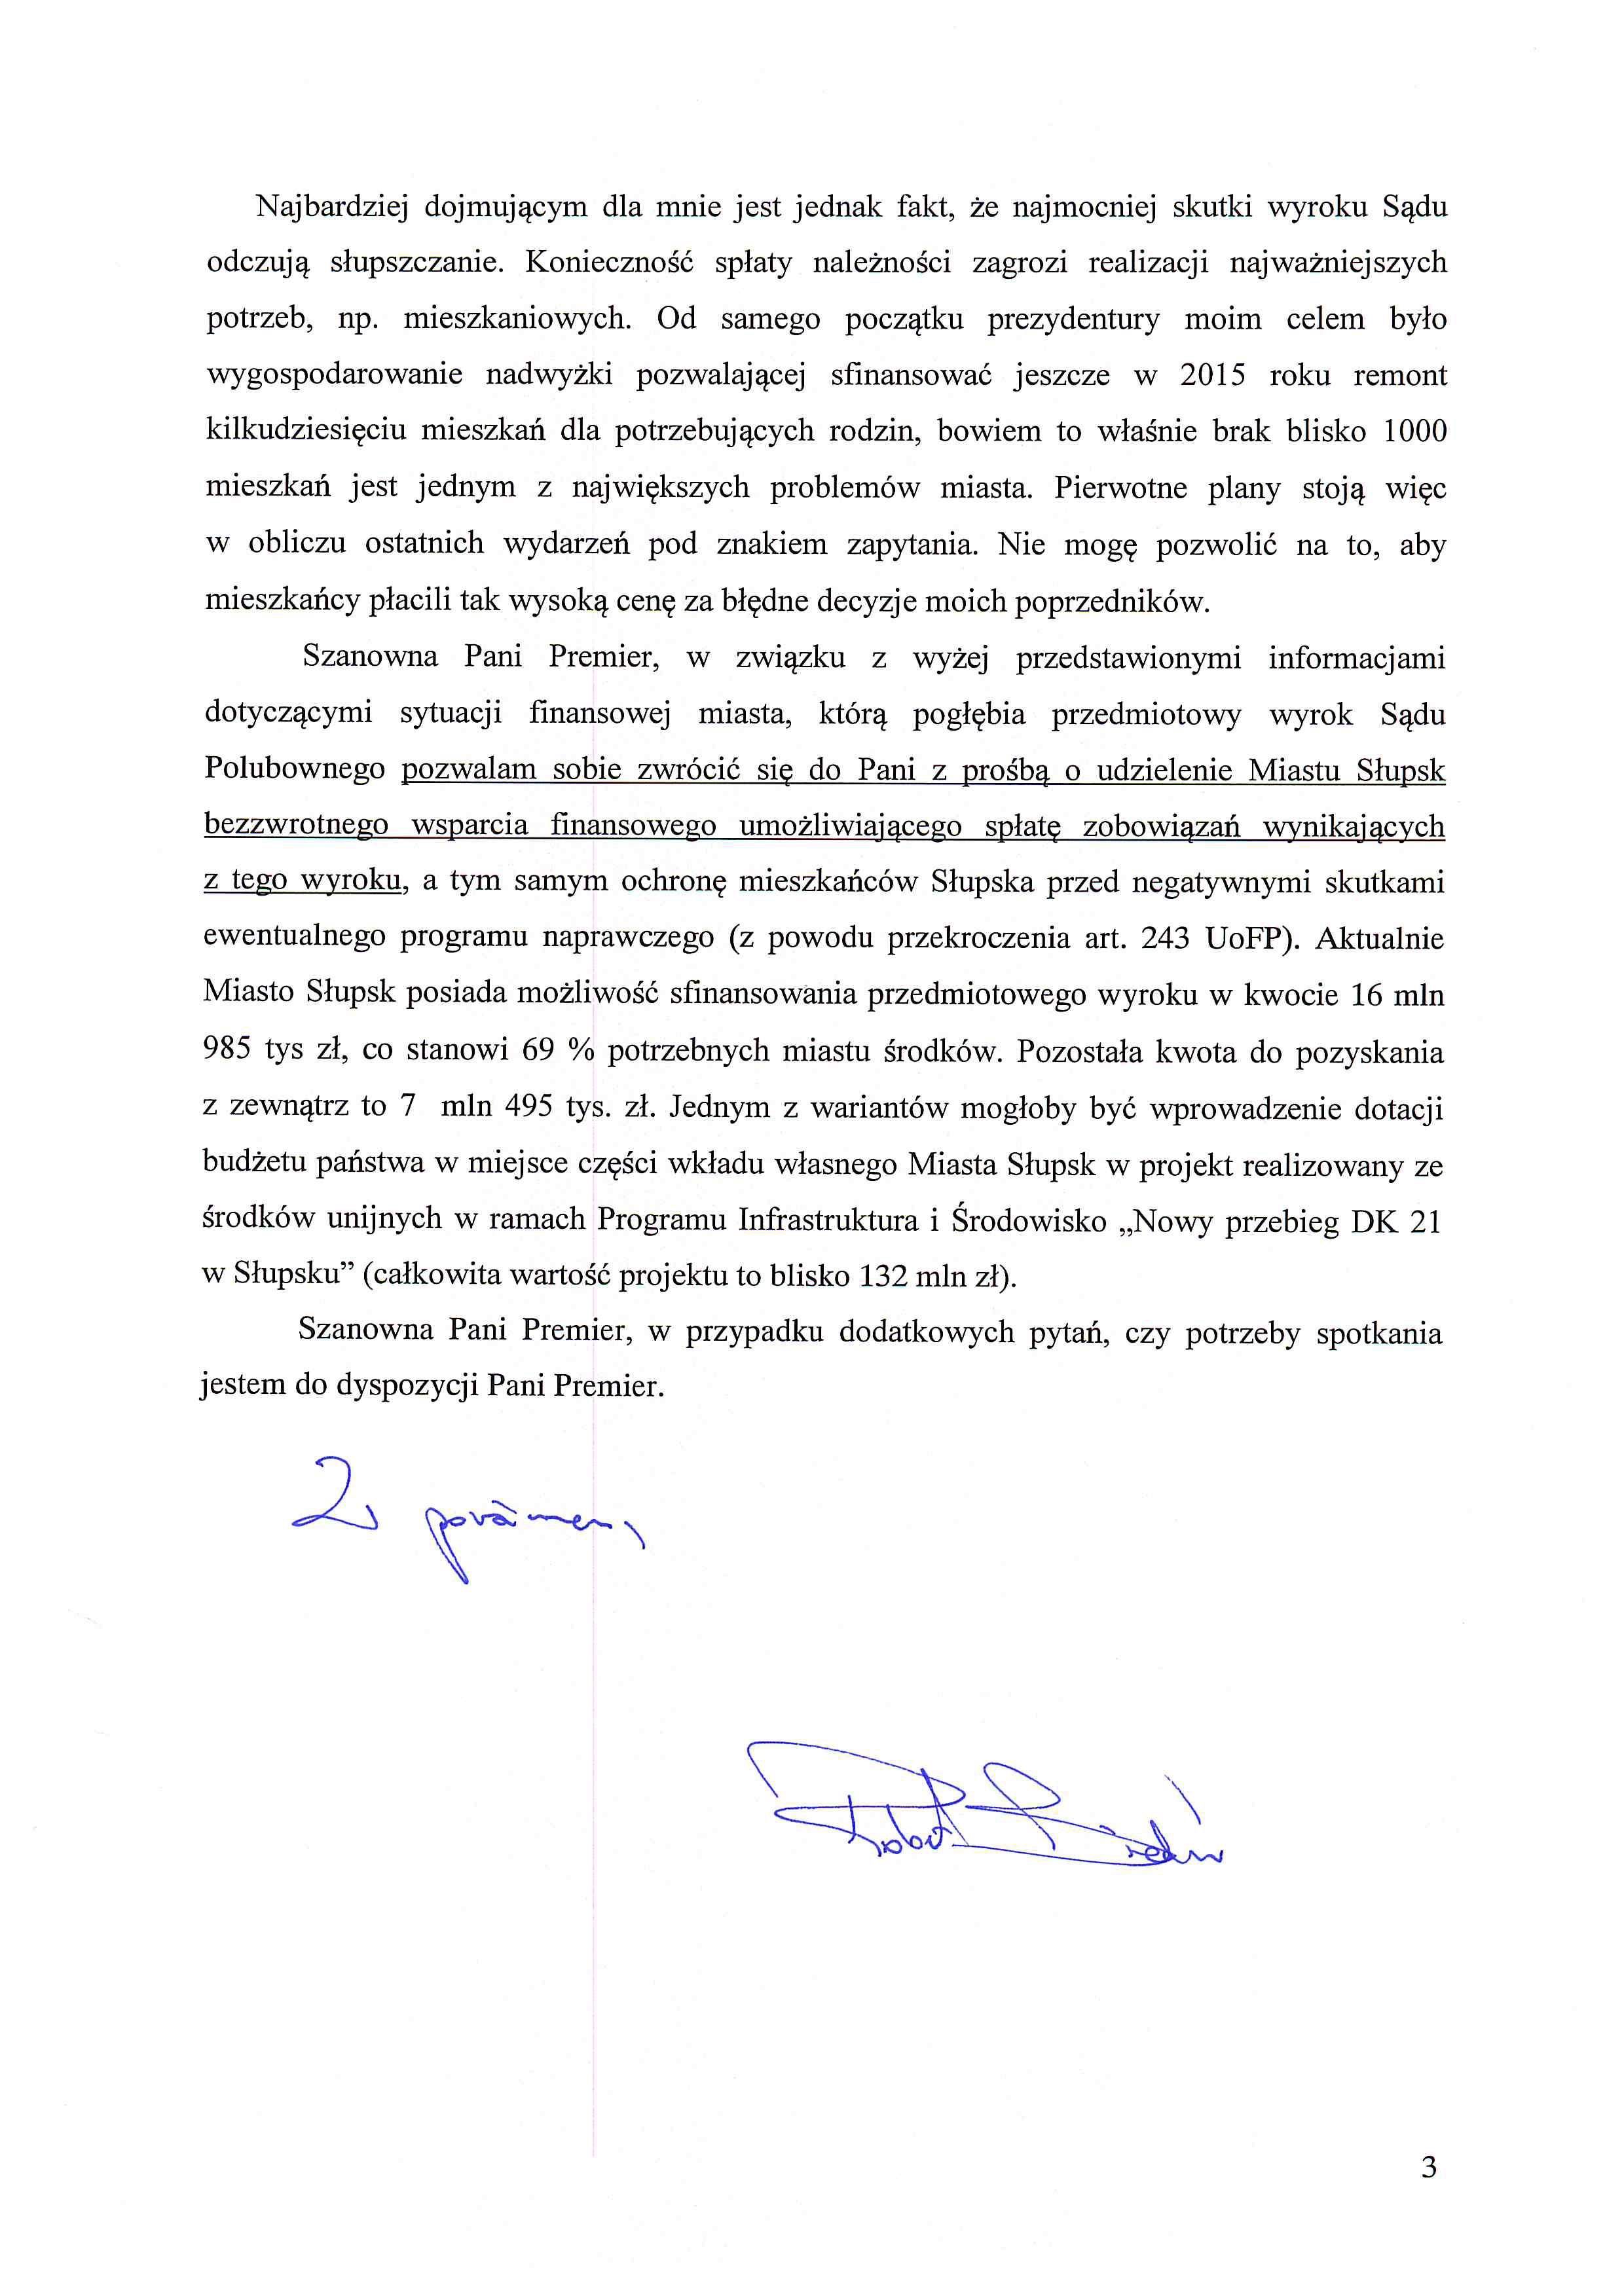 pismo do Pani premier